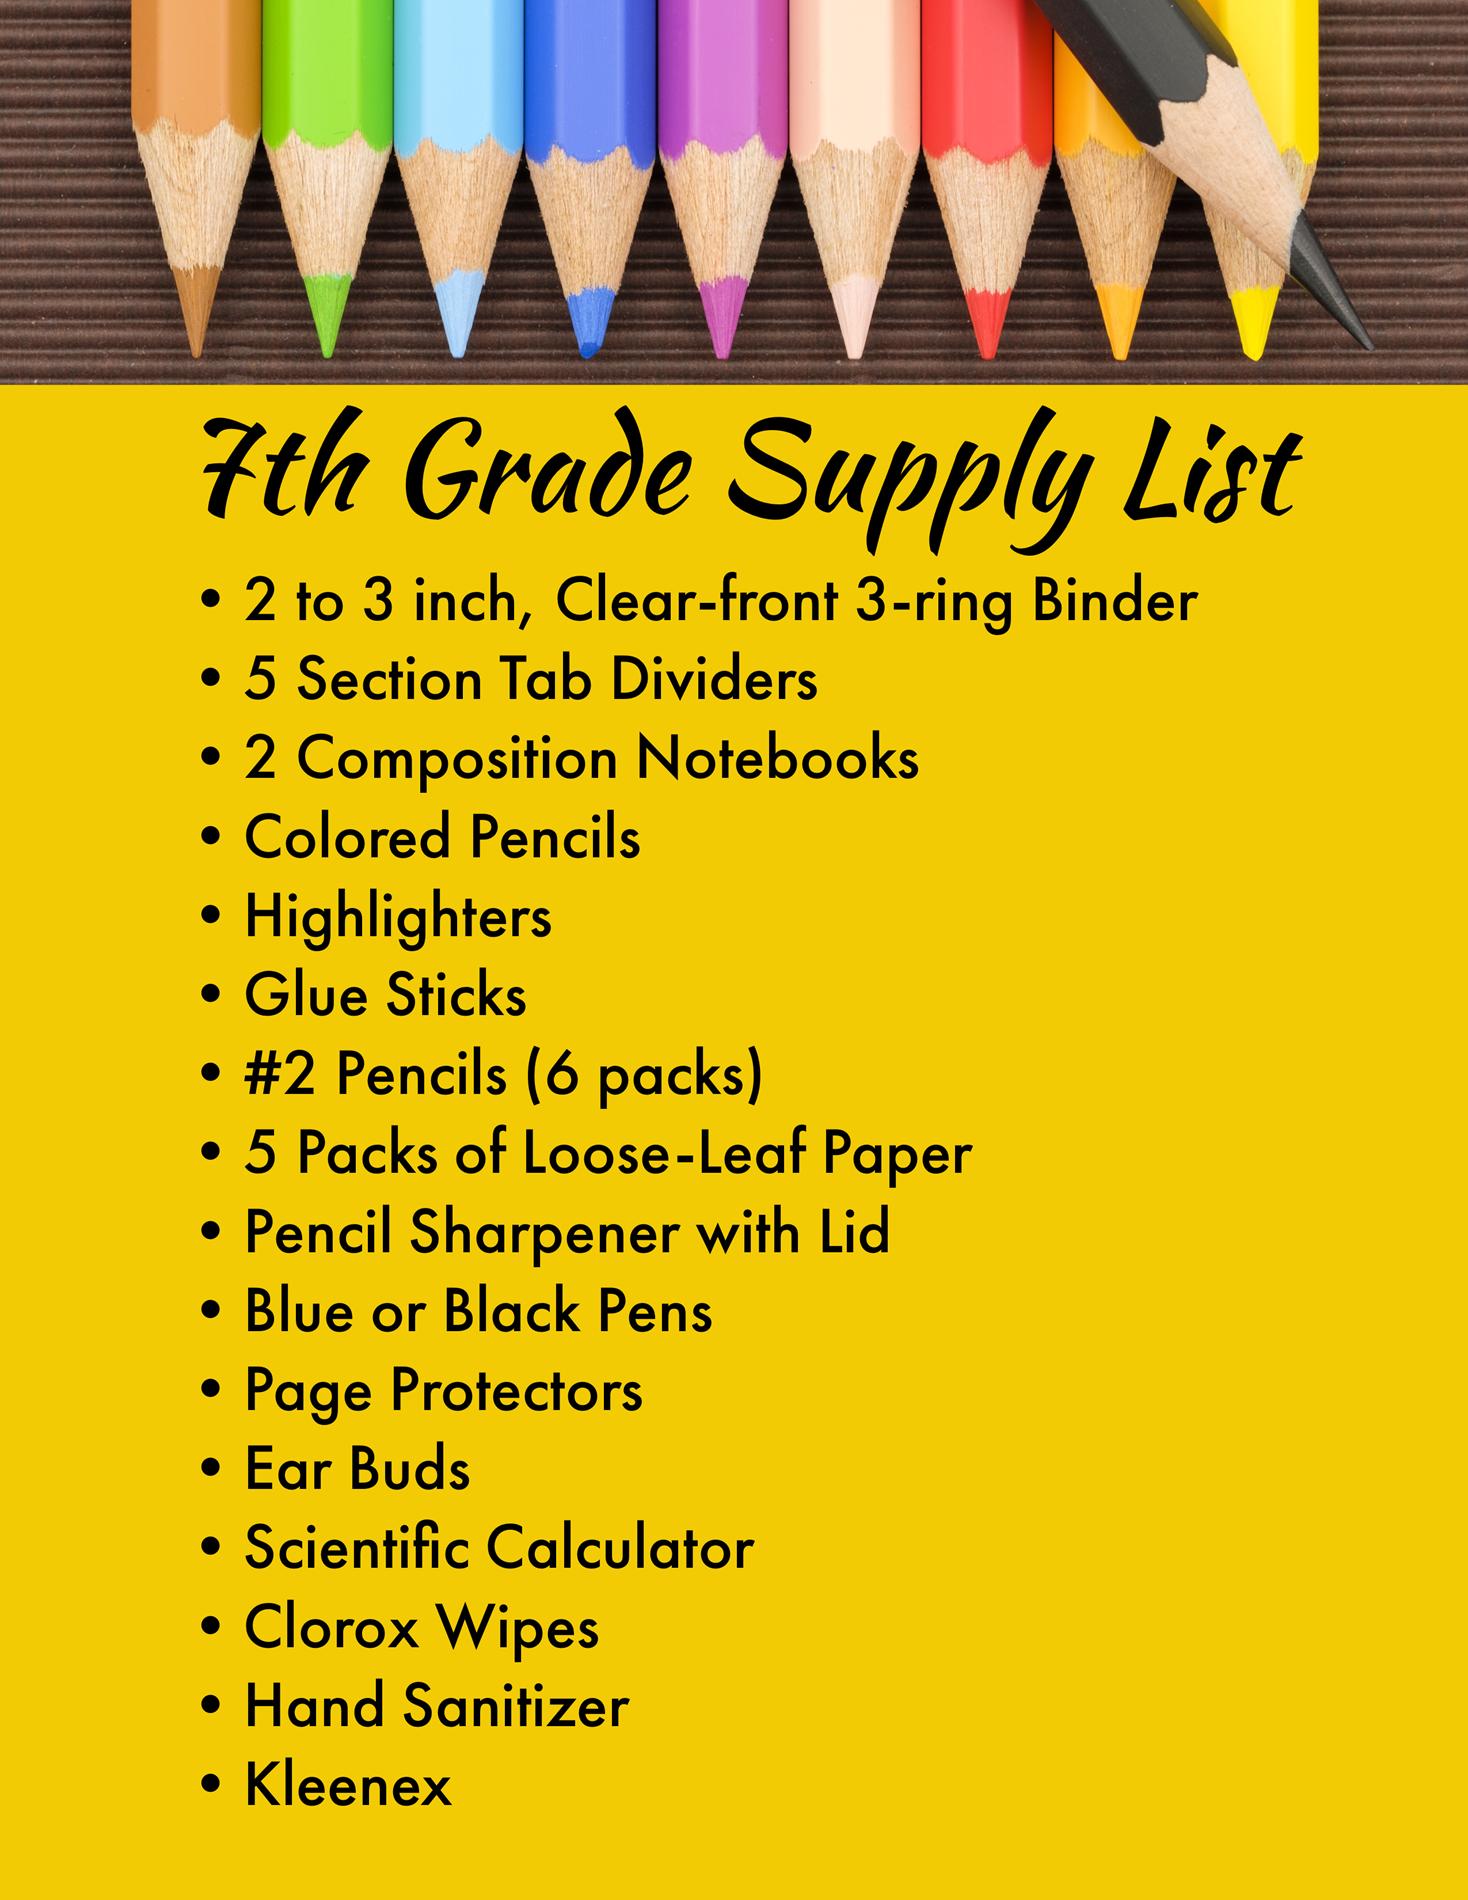 7th grade supplies